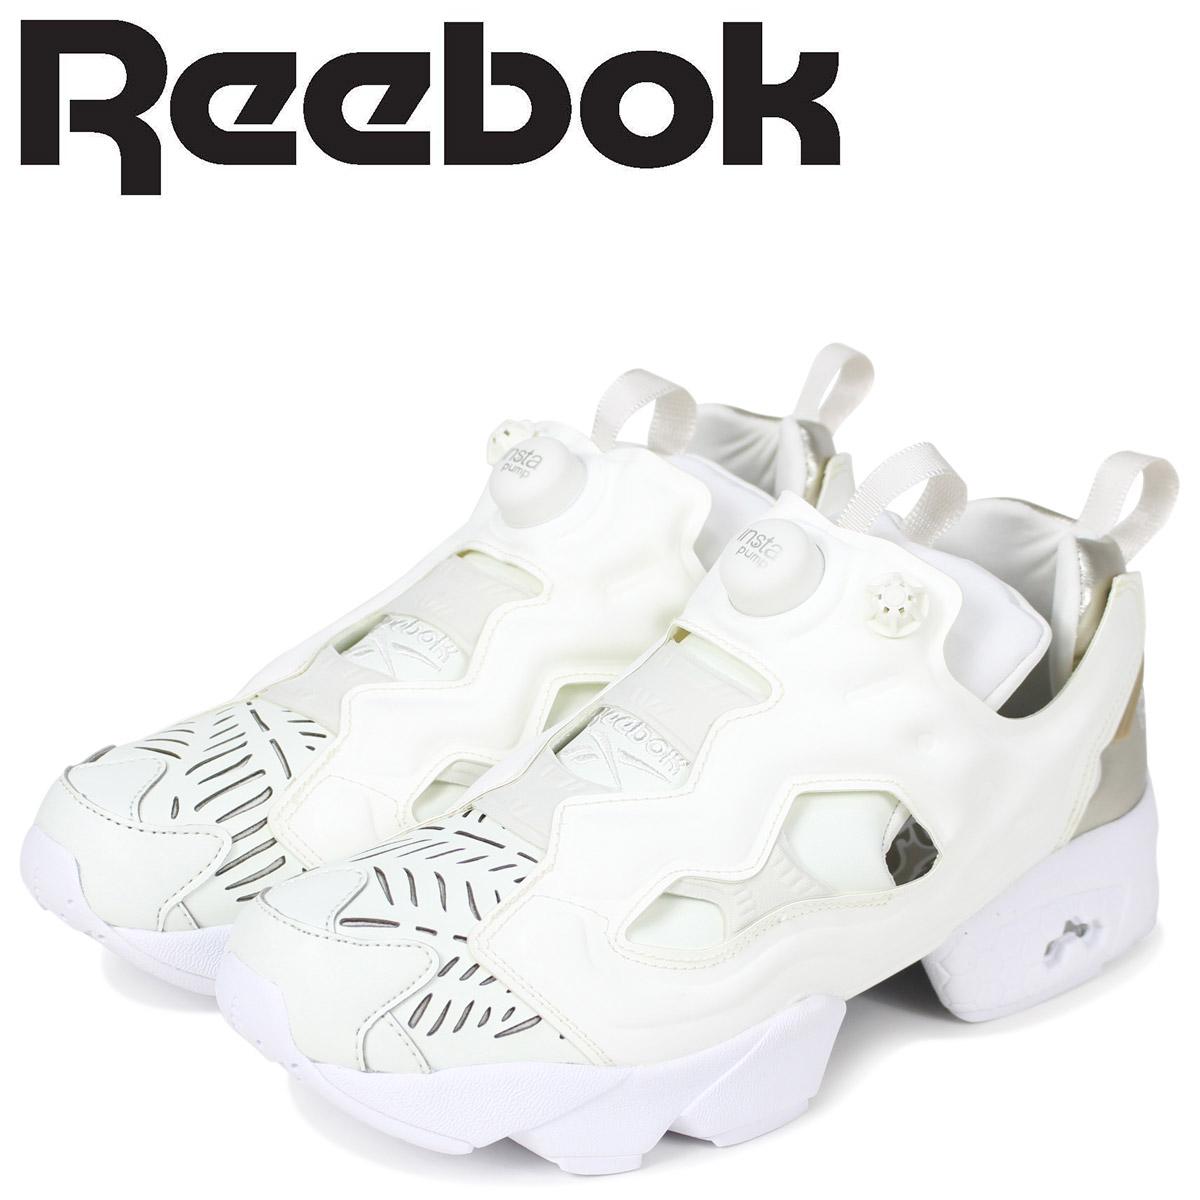 Reebok ポンプフューリー レディース メンズ スニーカー リーボック INSTAPUMP FURY CUTOUTS CM9817 ホワイト